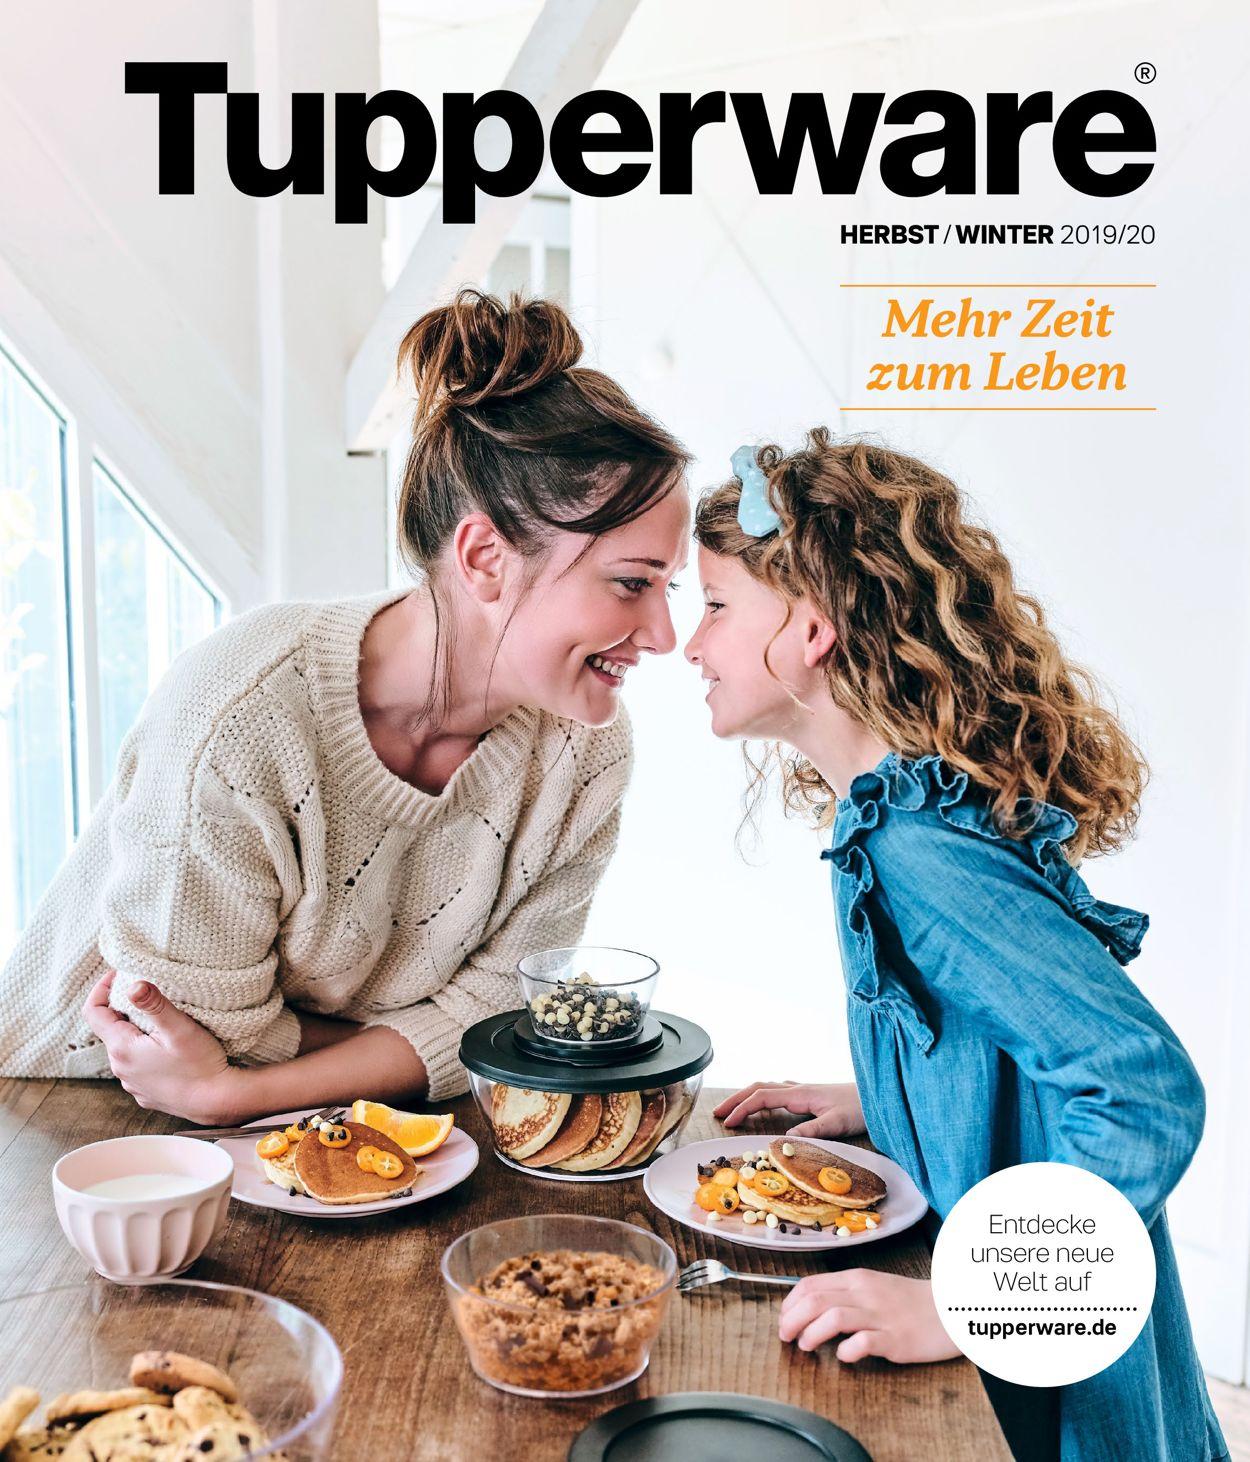 Tupperware Aktueller Prospekt 02.09  31.01.2020  Jedewoche within Tupperware Januar 2020